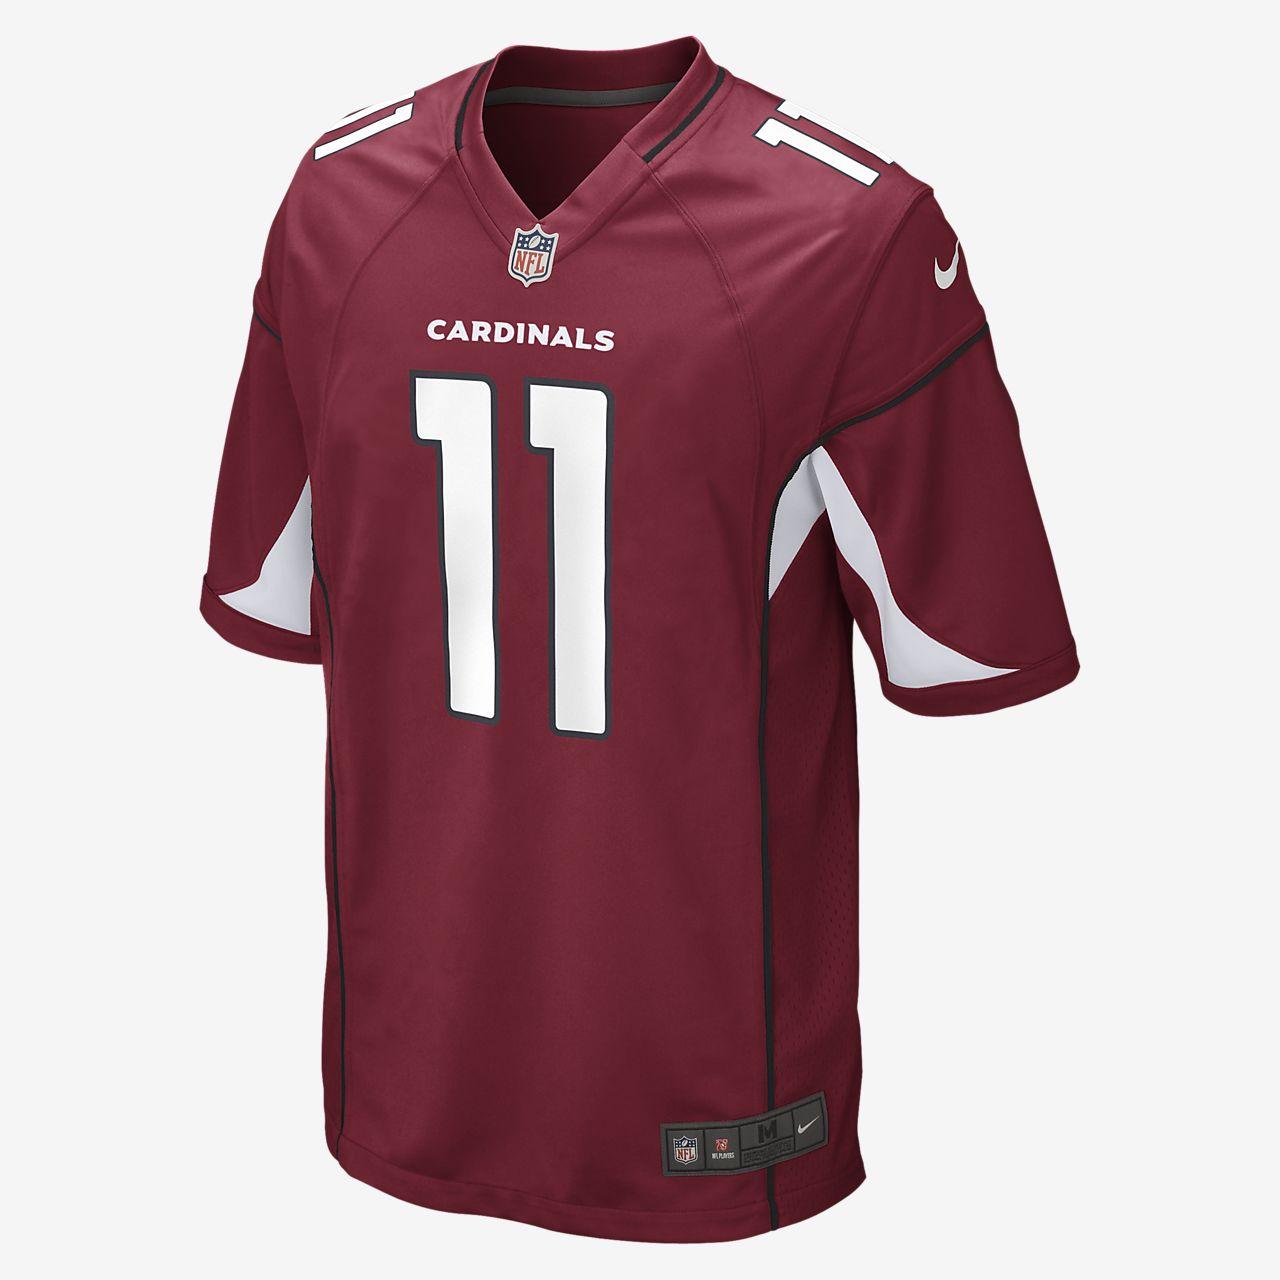 Maglia da football americano NFL Arizona Cardinals (Larry Fitzgerald) Game - Uomo